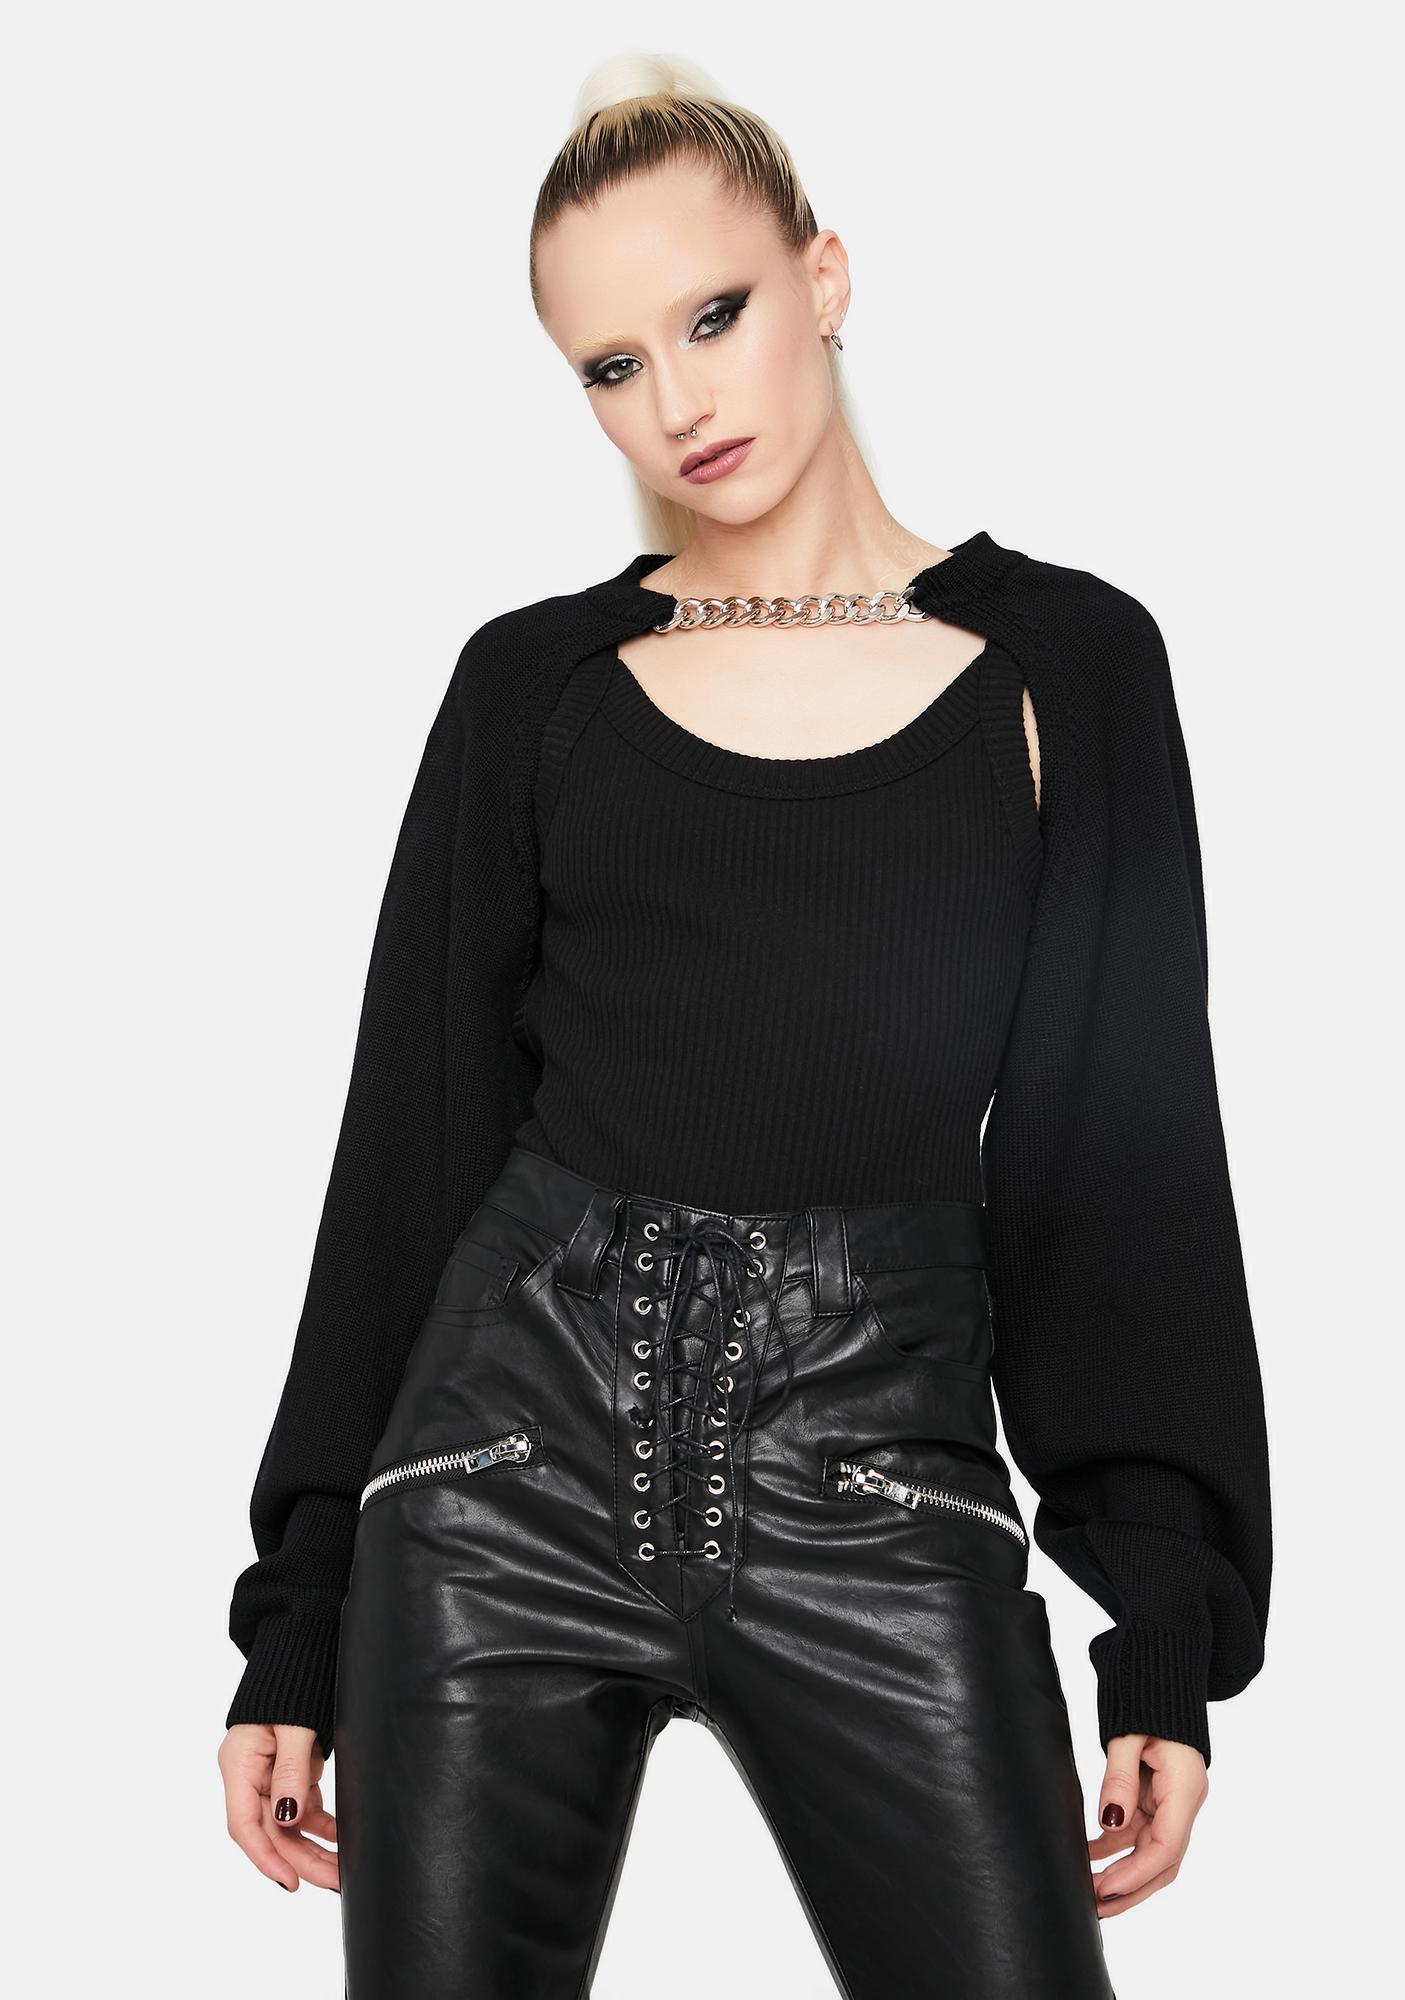 Dark Style Hype Chain Shrug